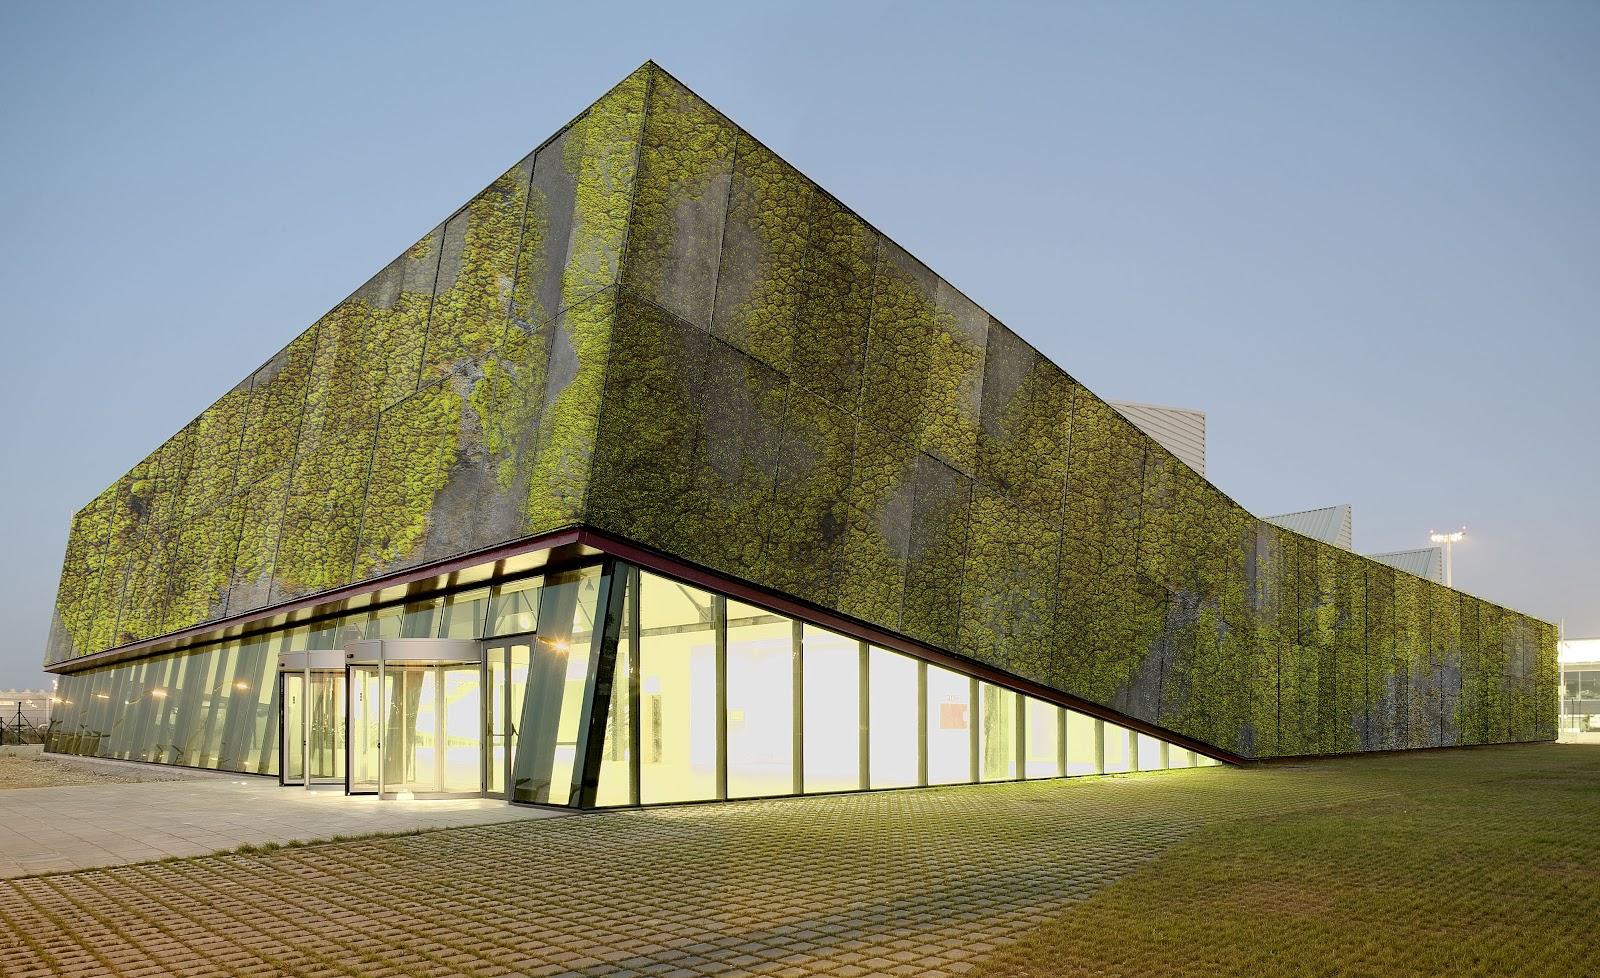 hormigon-biologico-fachada-vegetal.jpg